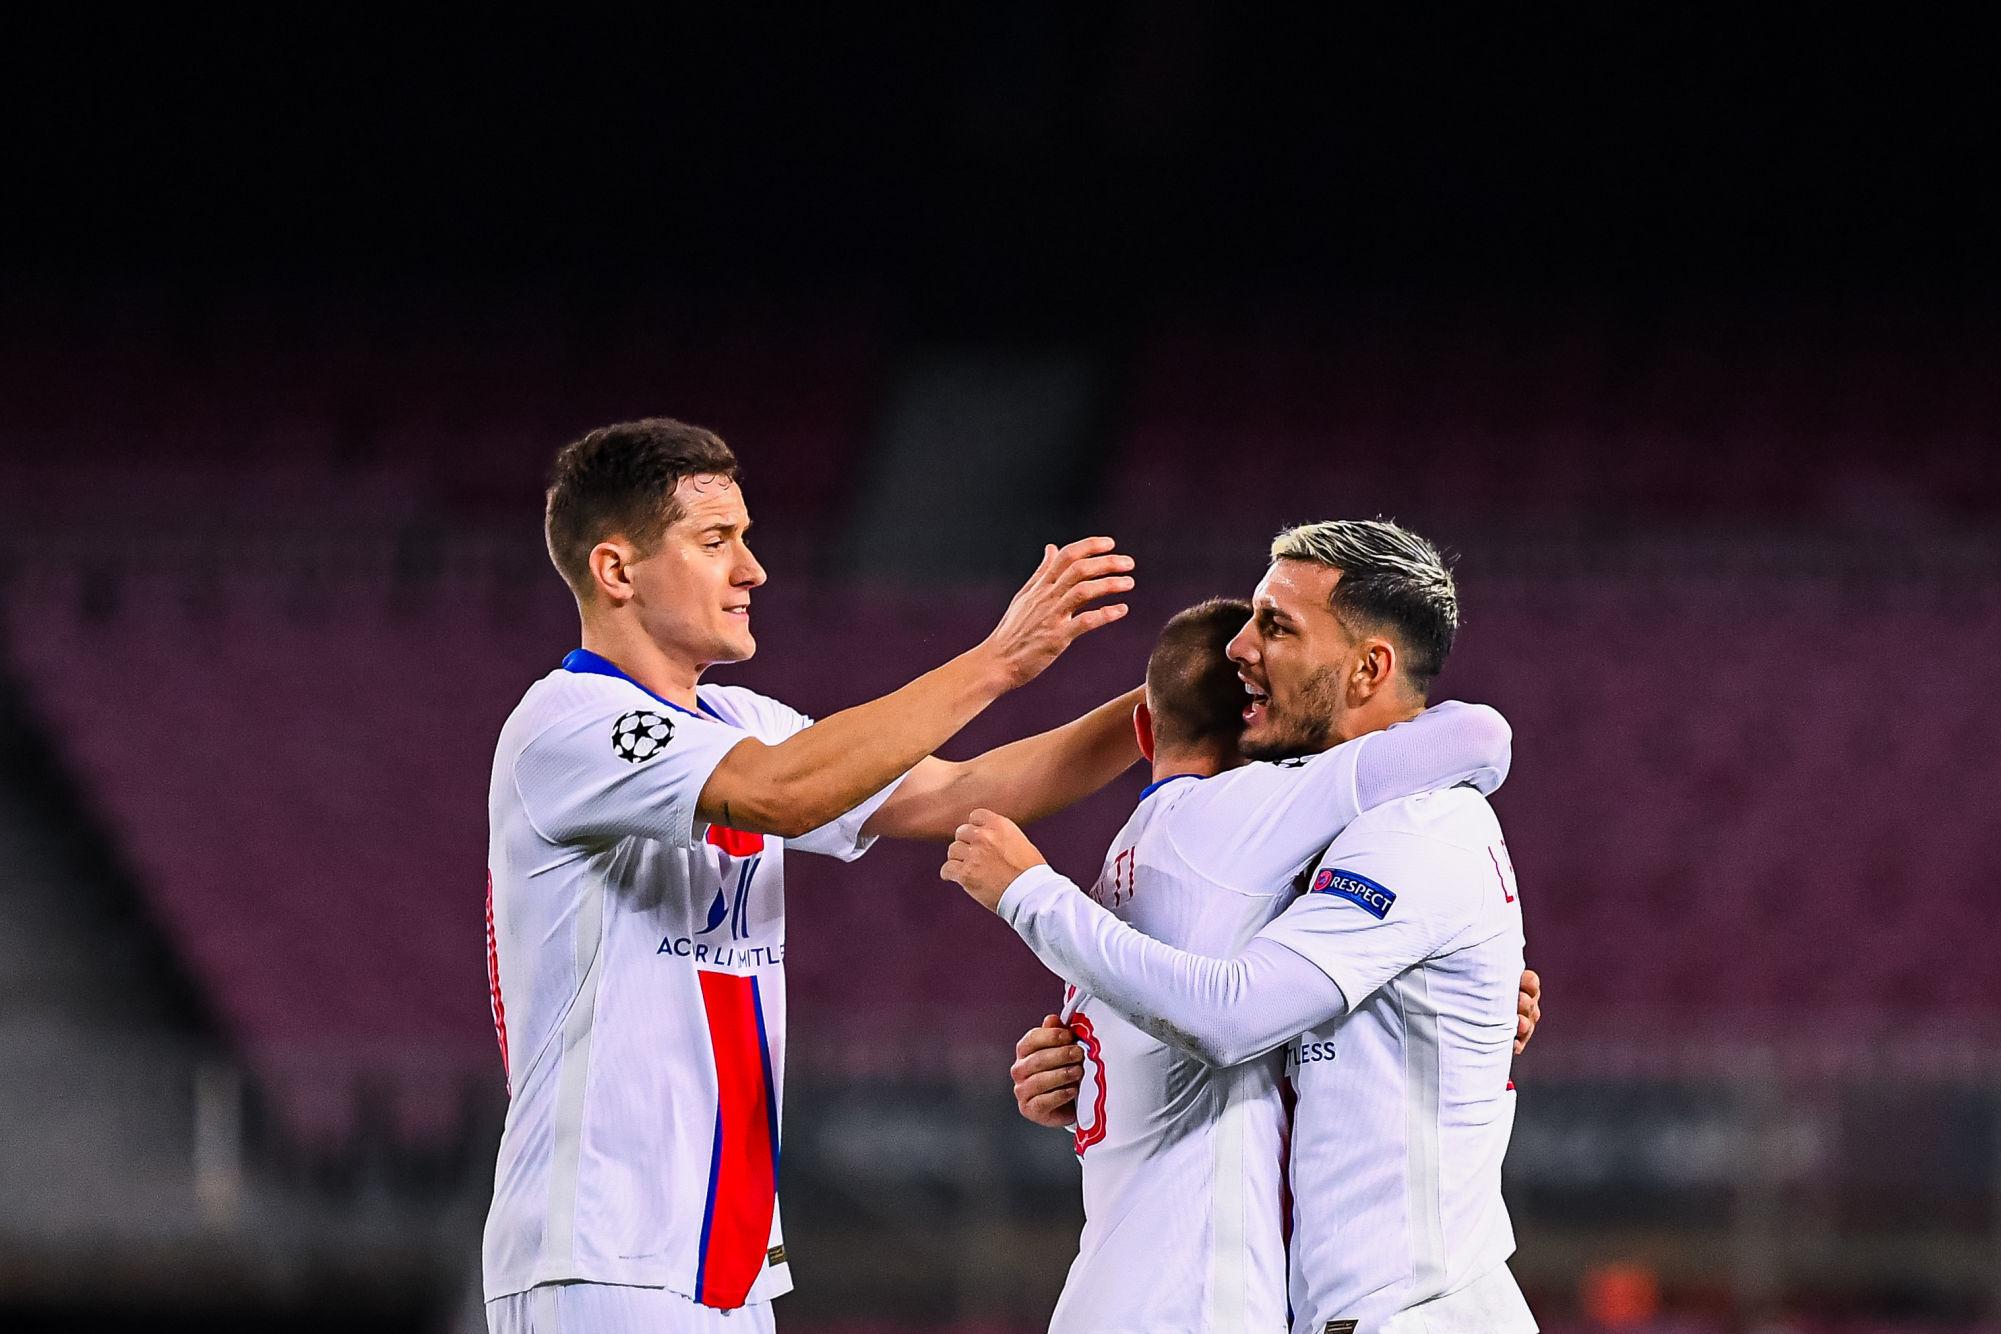 Herrera se confie : objectifs, Ligue 1, Ligue des Champions, Pochettino et Sergio Ramos